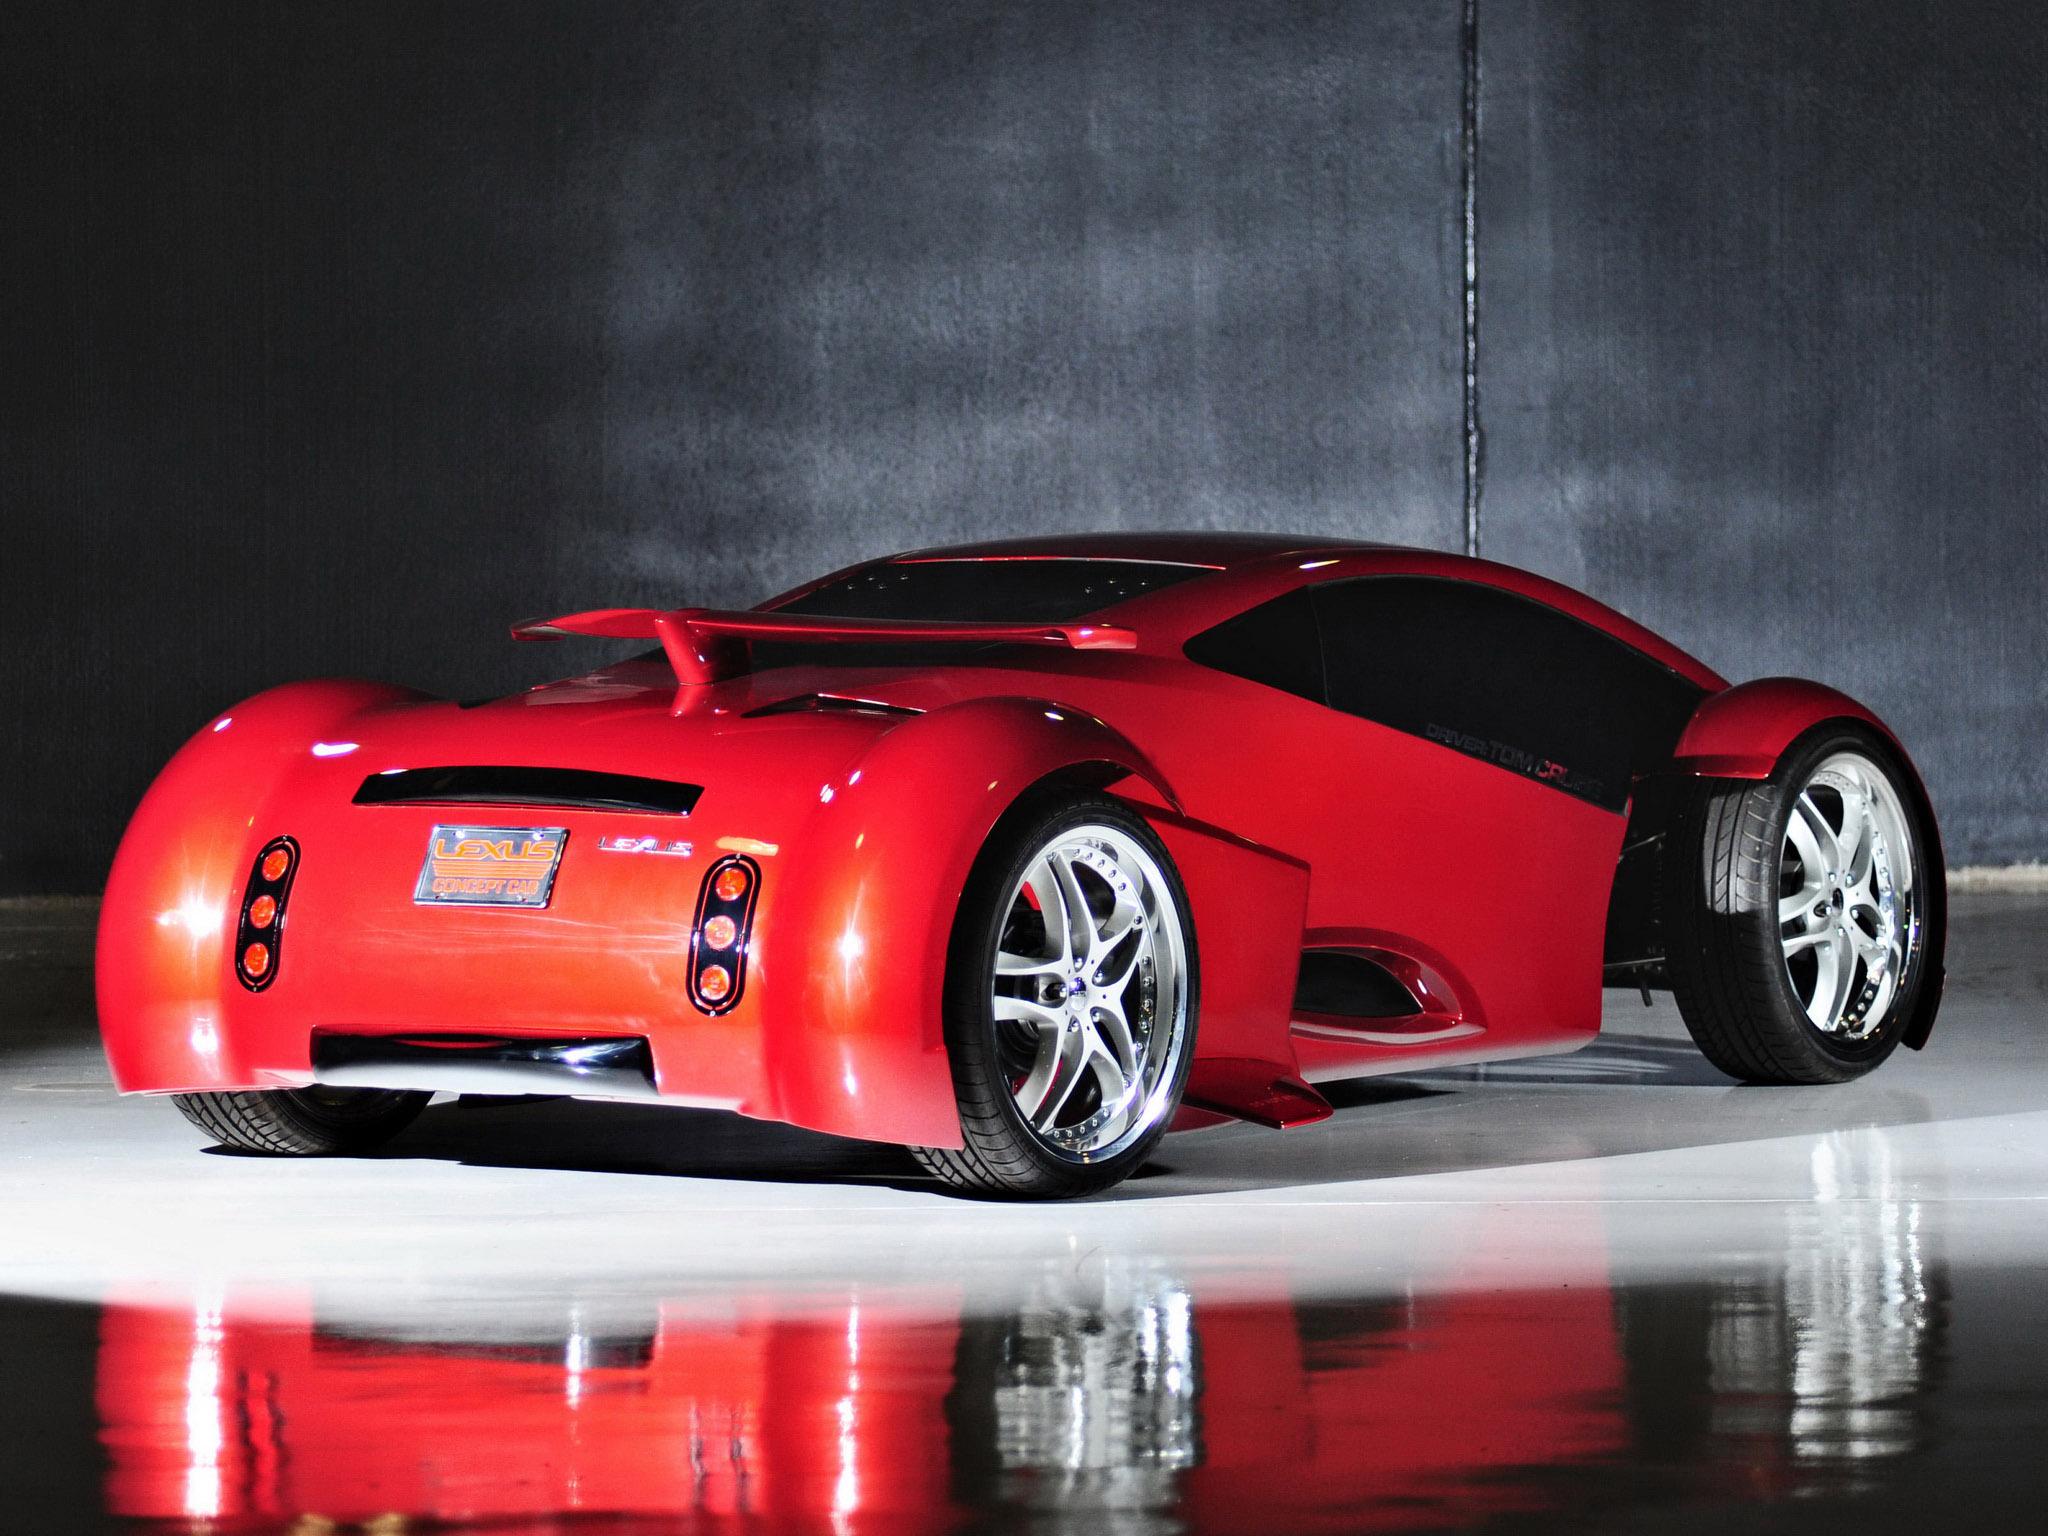 2002 Lexus Minority Report Concept 2054 supercar f ...